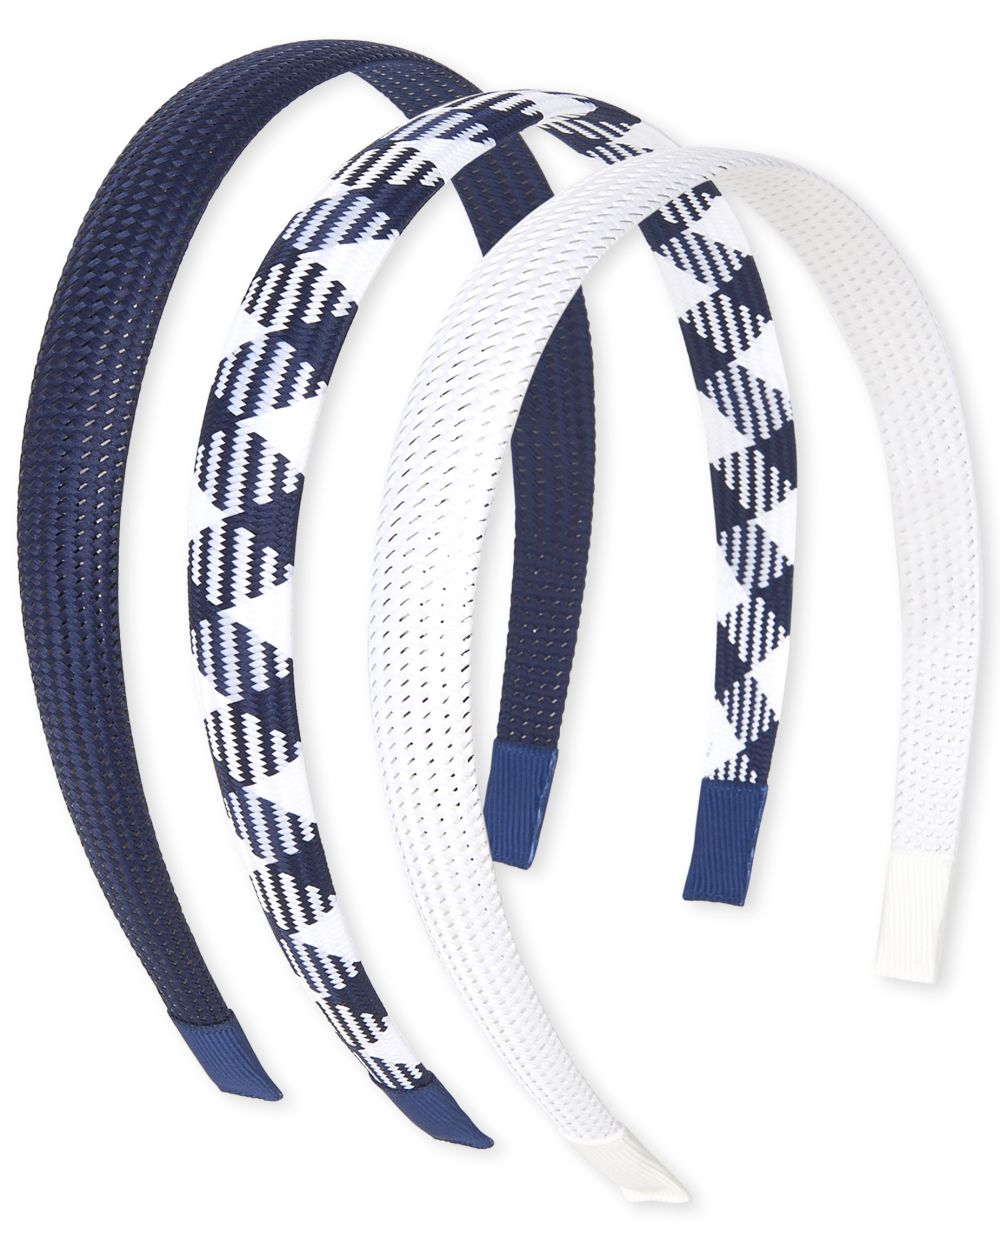 Girls Uniform Headband 3-Pack